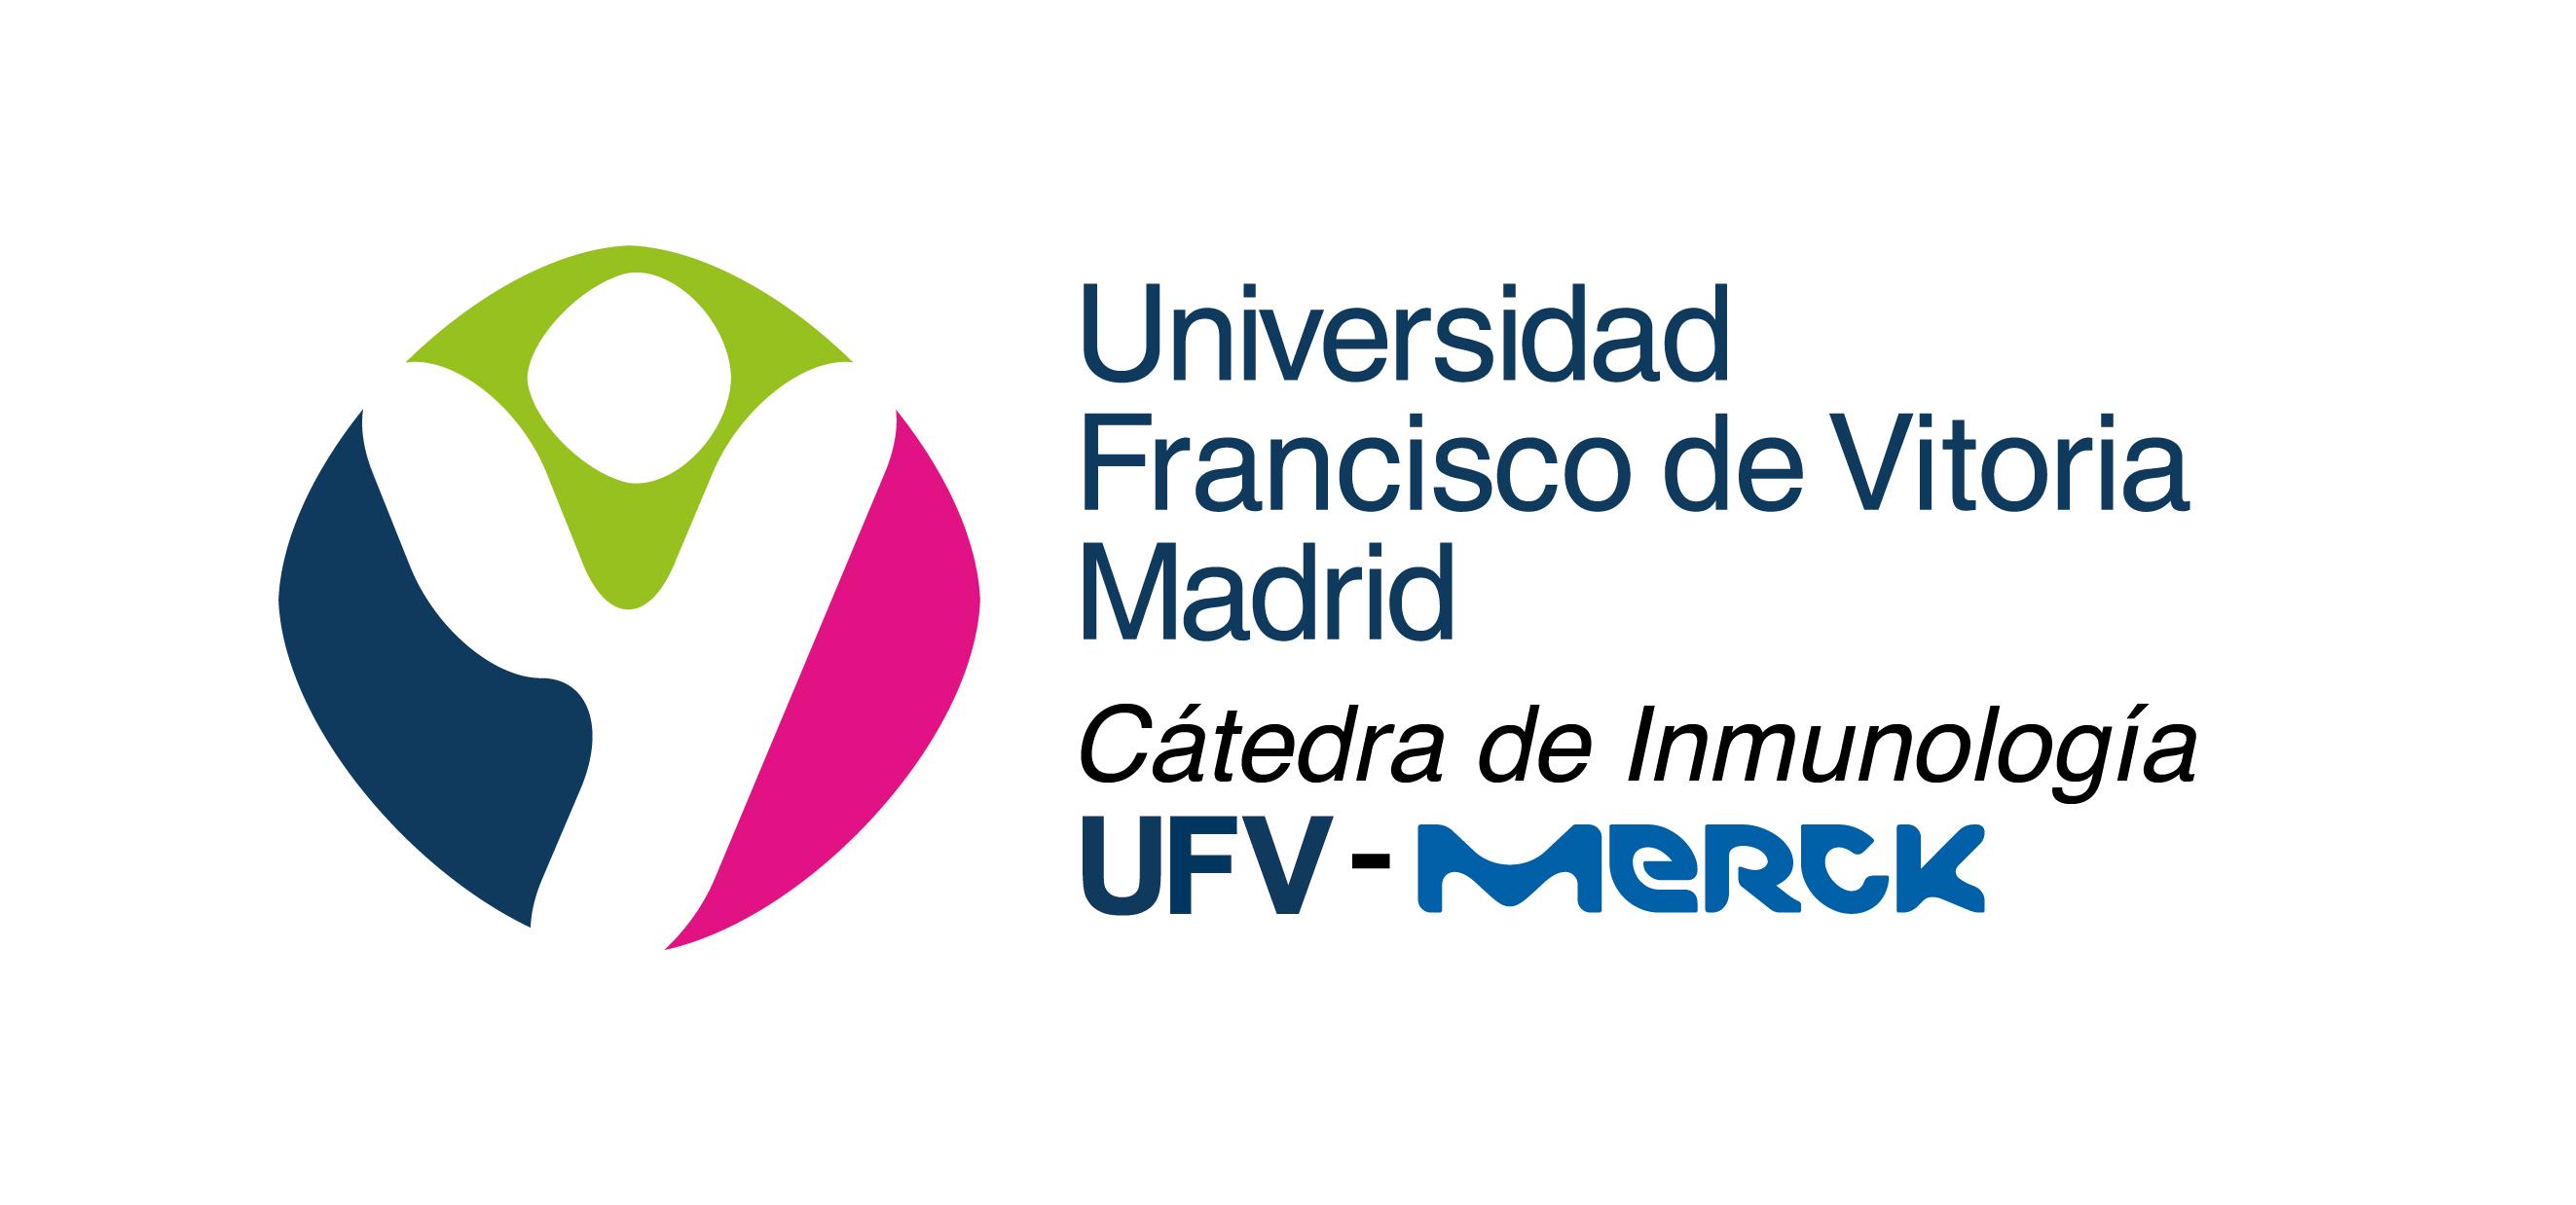 II Convocatoria de Premios al Talento Novel de la Cátedra de Inmunología UFV-Merck